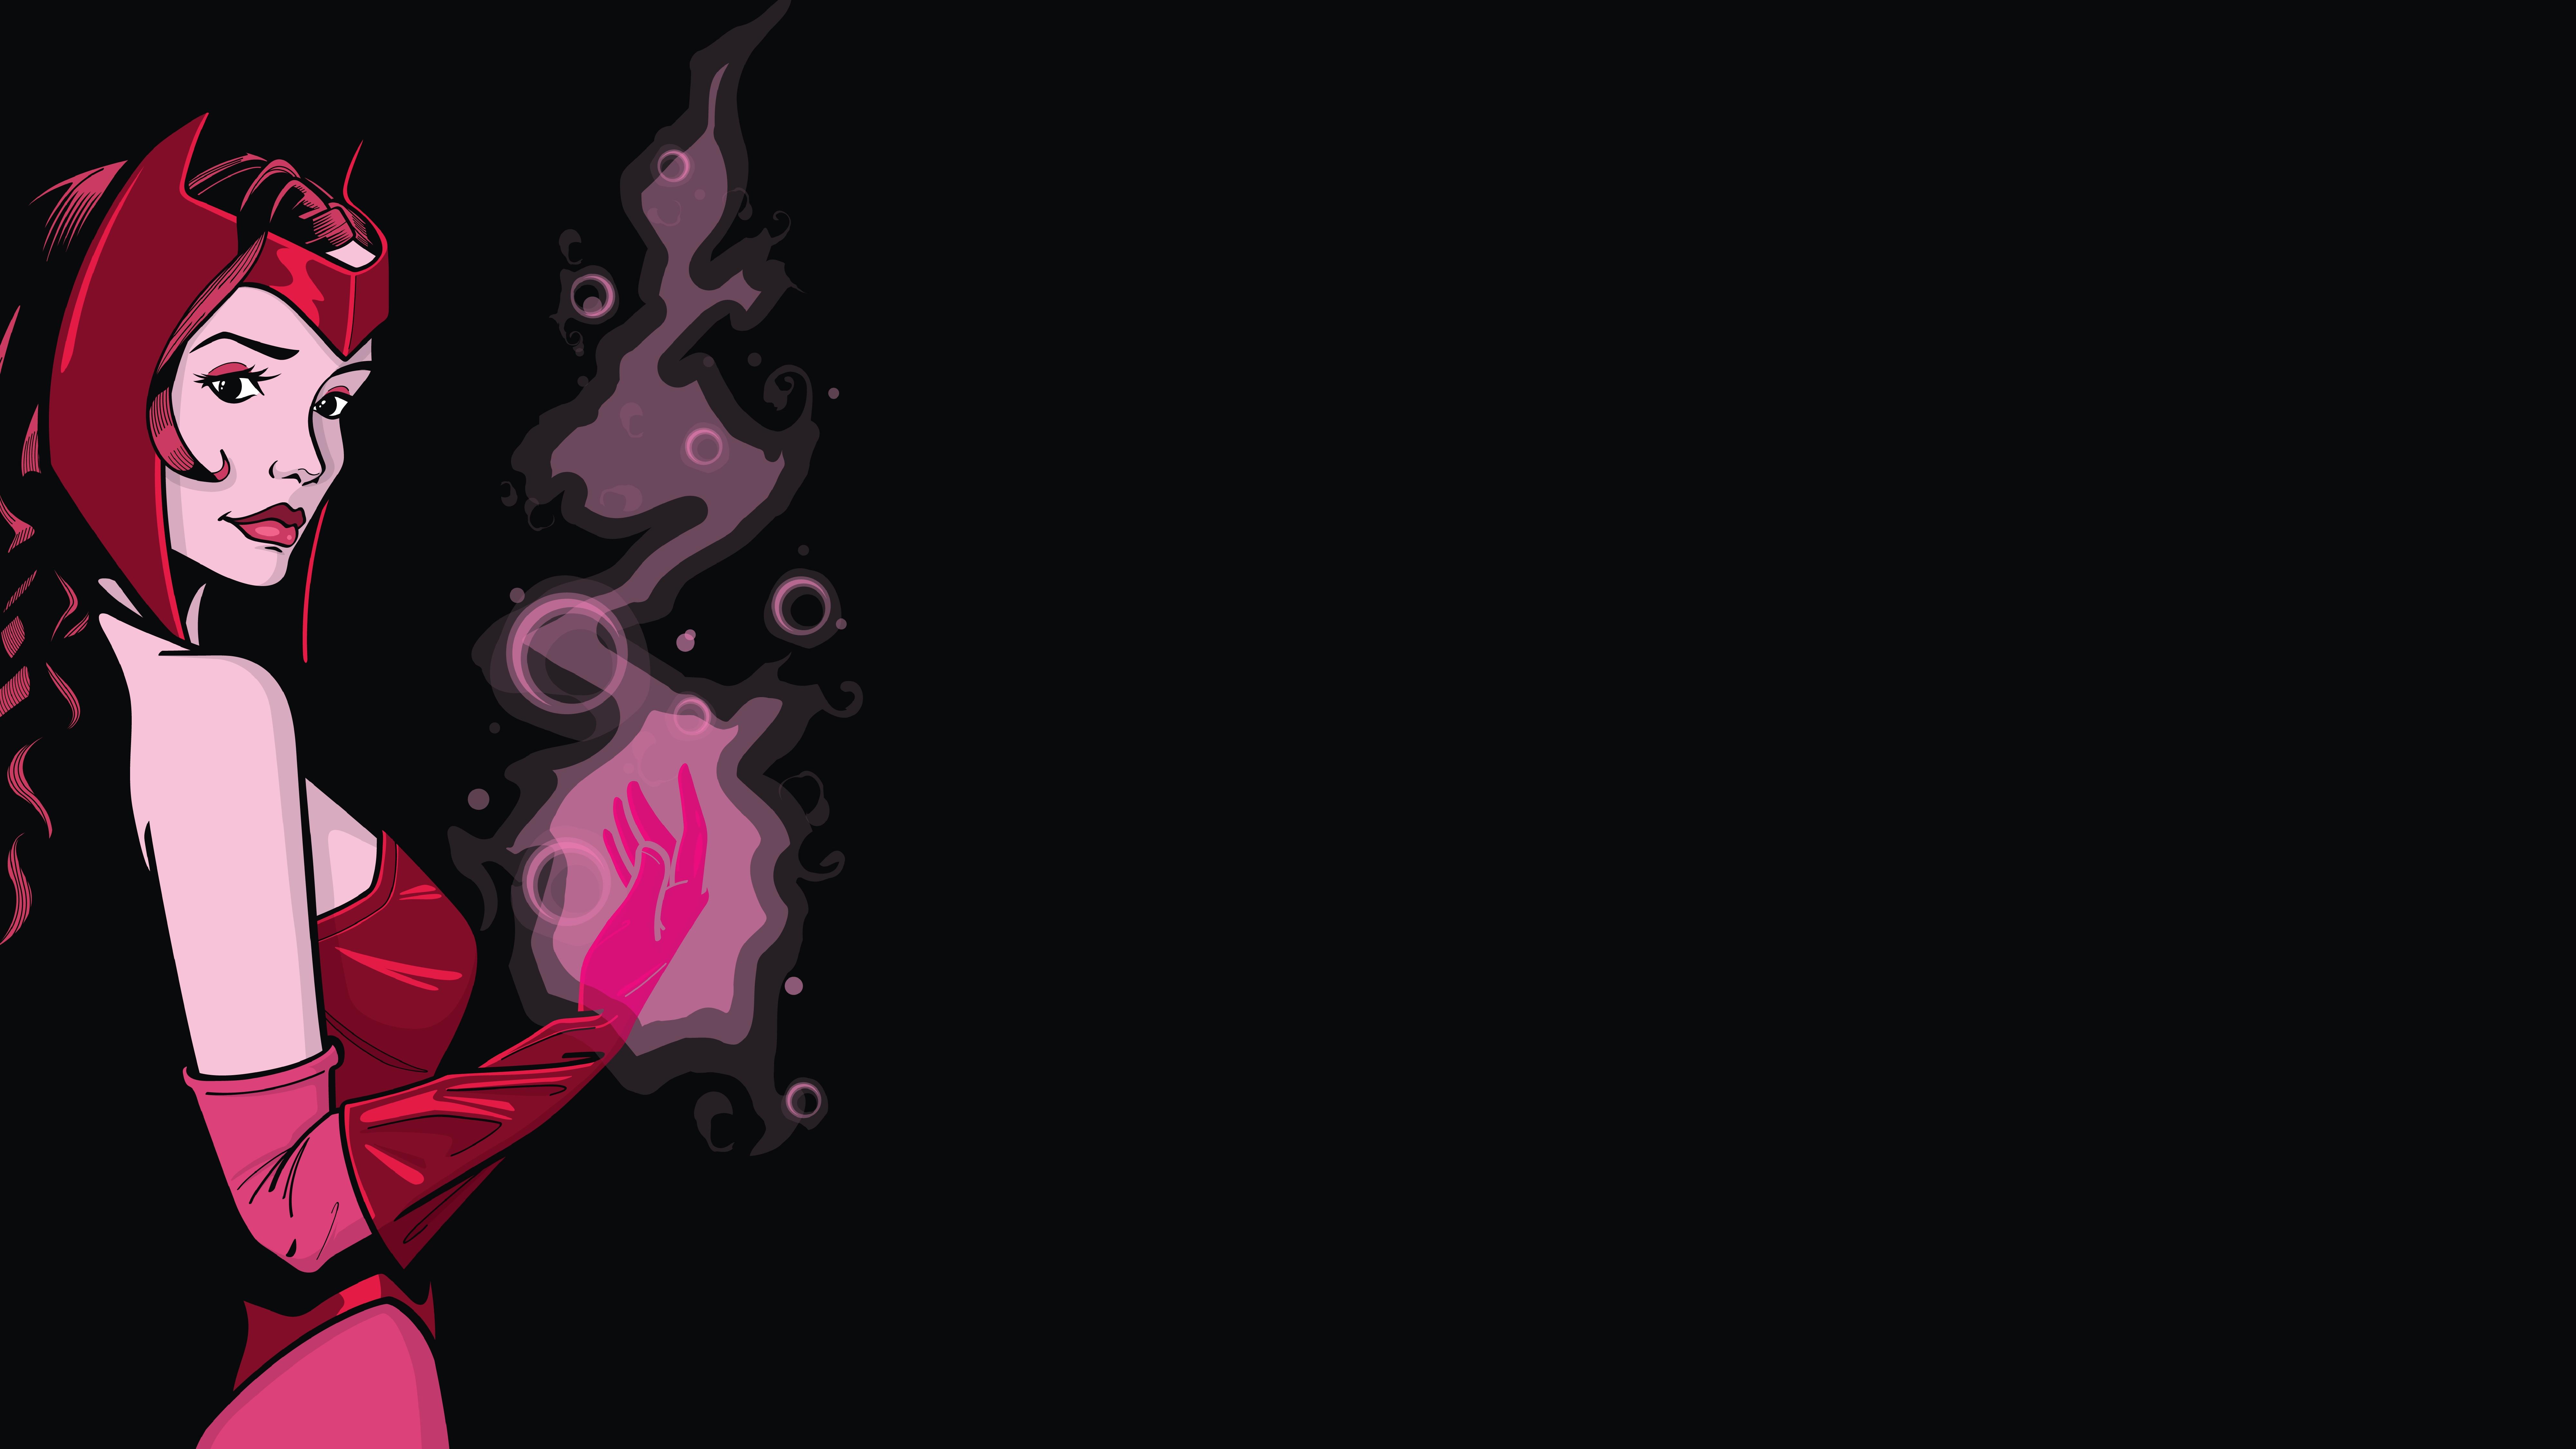 Wonderful Wallpaper Marvel Scarlet Witch - scarlet_witch-12  Graphic_986920.jpg